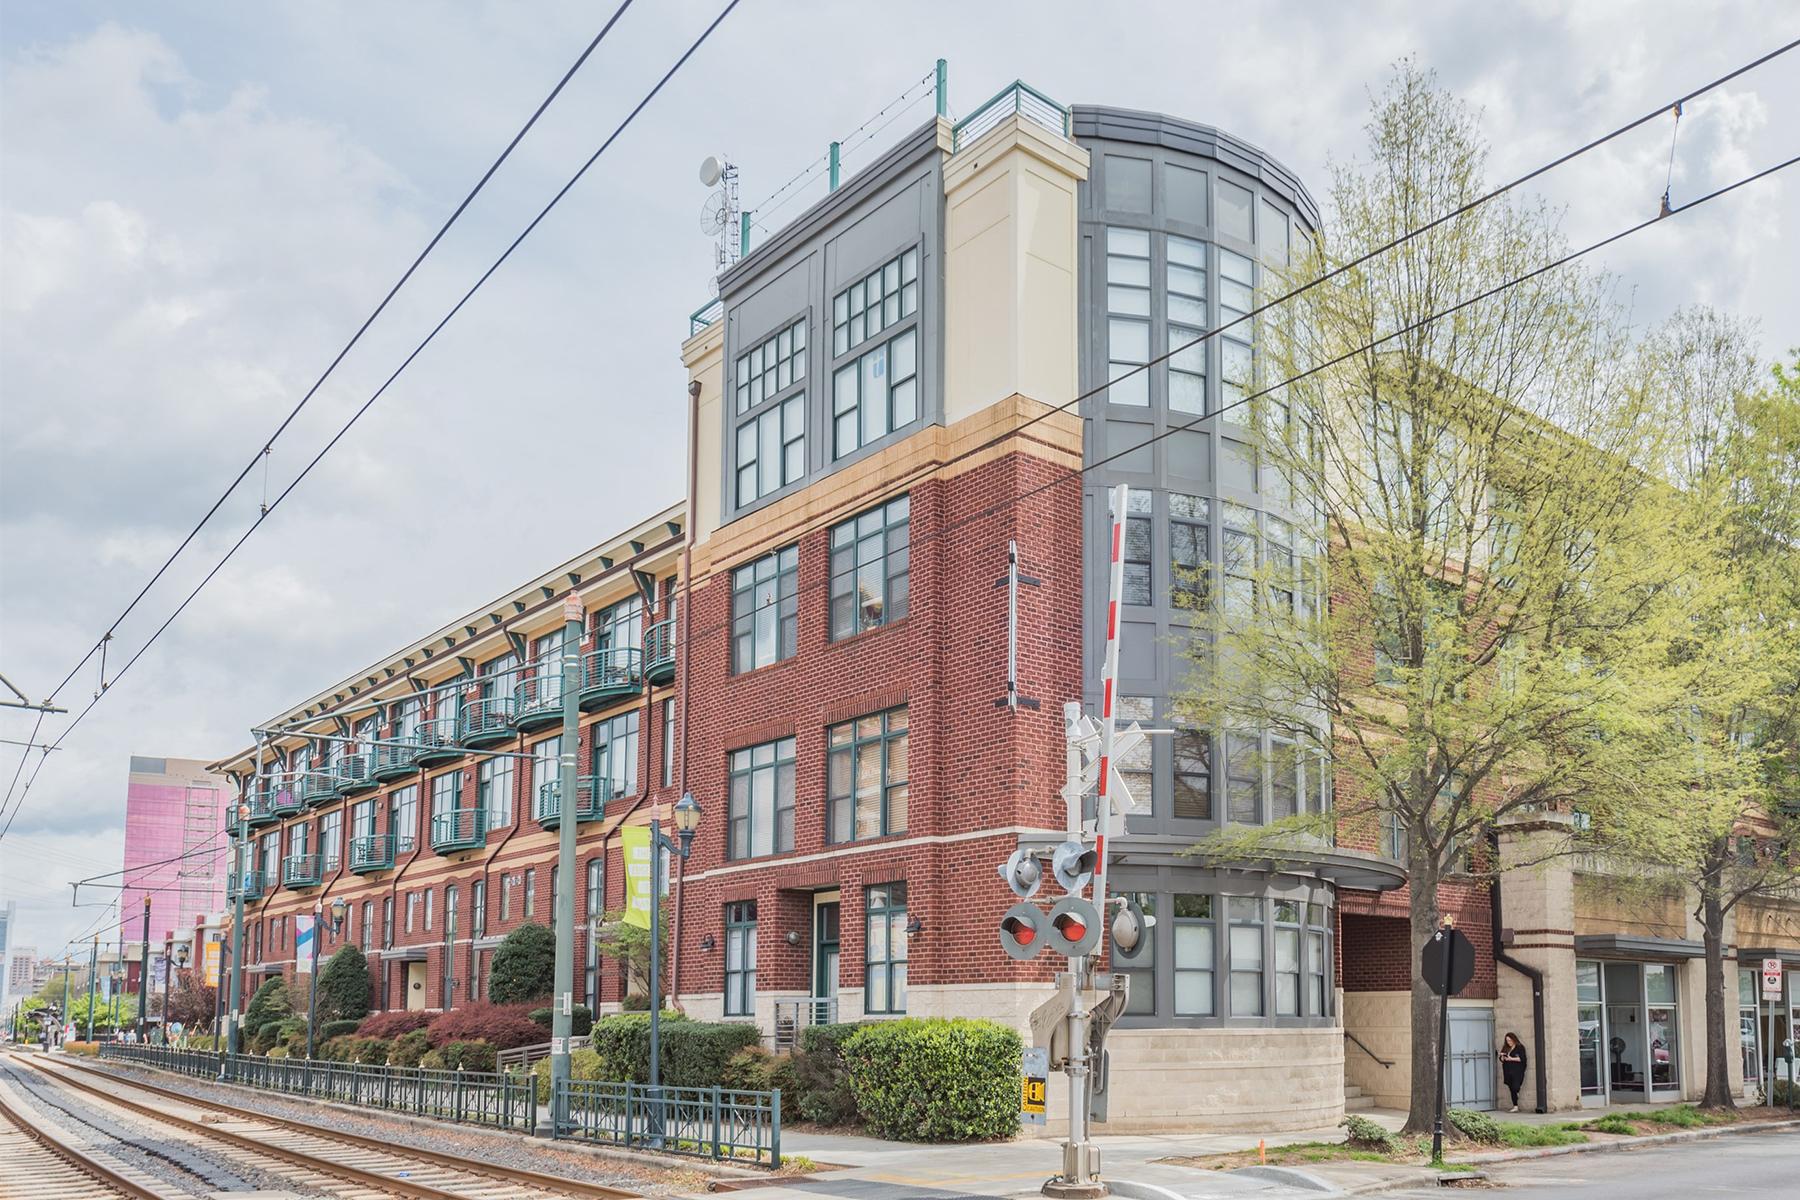 Condominium for Sale at SOUTH END 115 E Park Ave 104, Charlotte, North Carolina 28203 United States